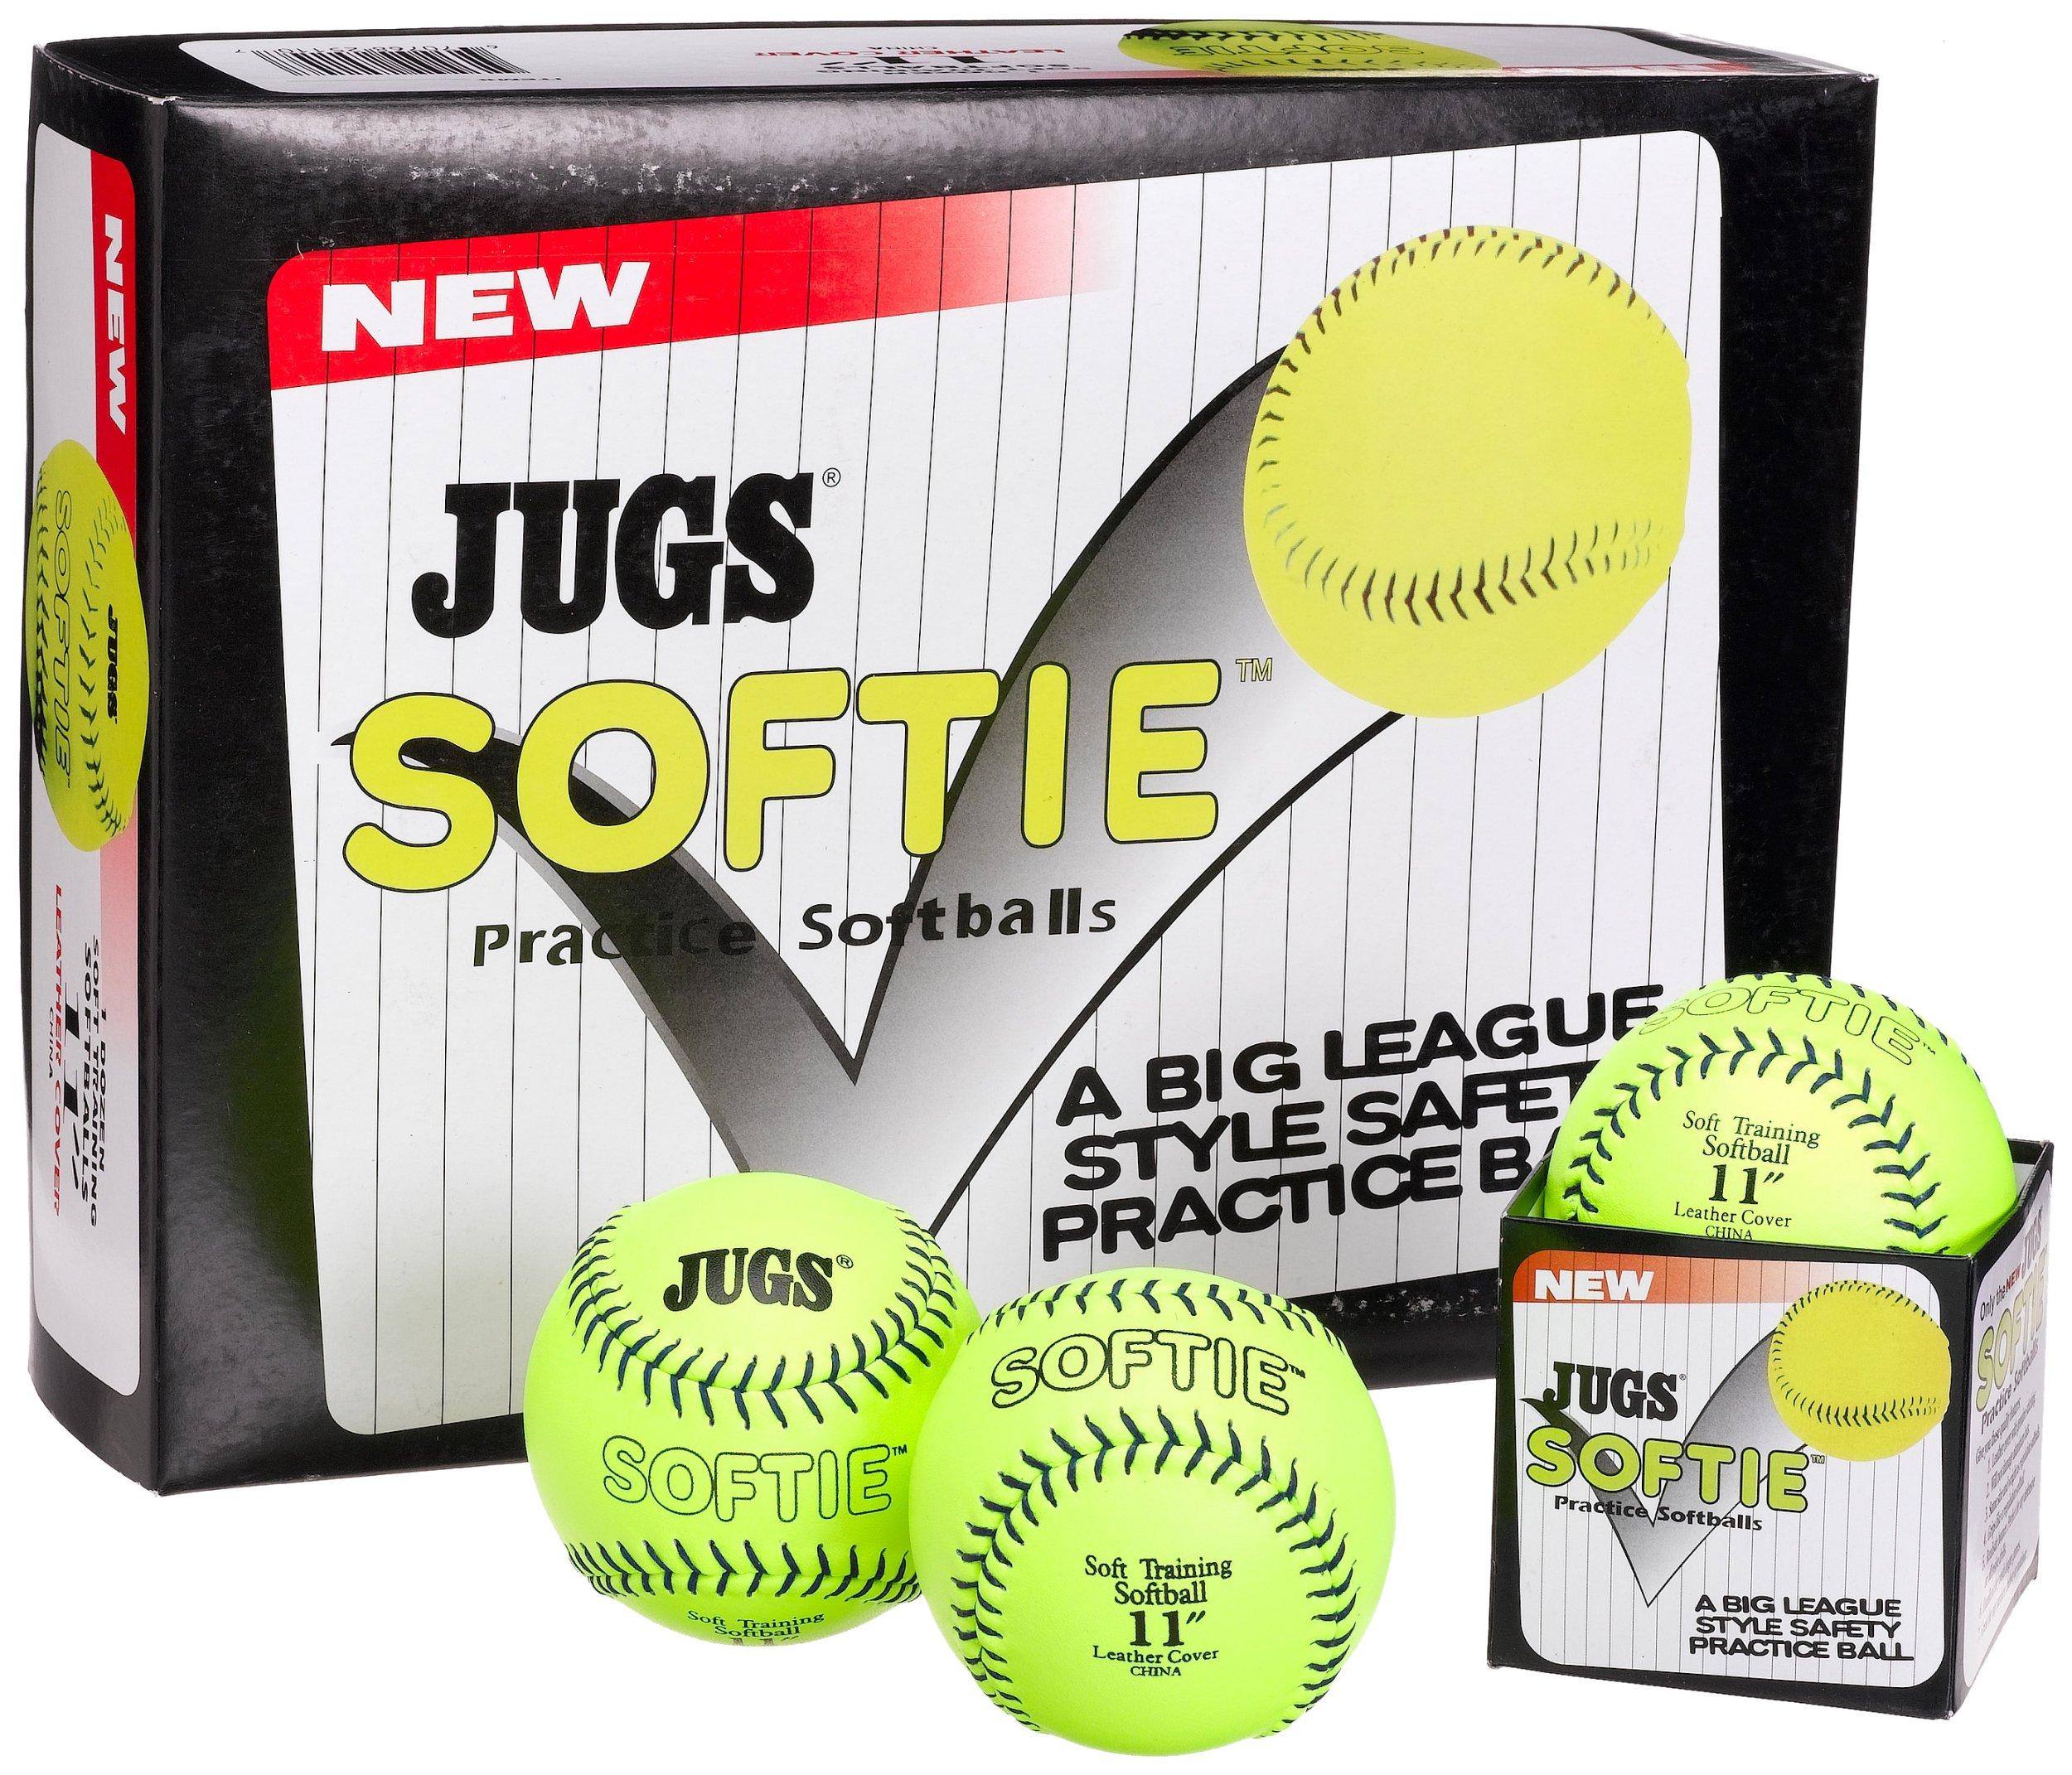 Amazon.com: Jugs Softie Practice Softballs: Sports & Outdoors